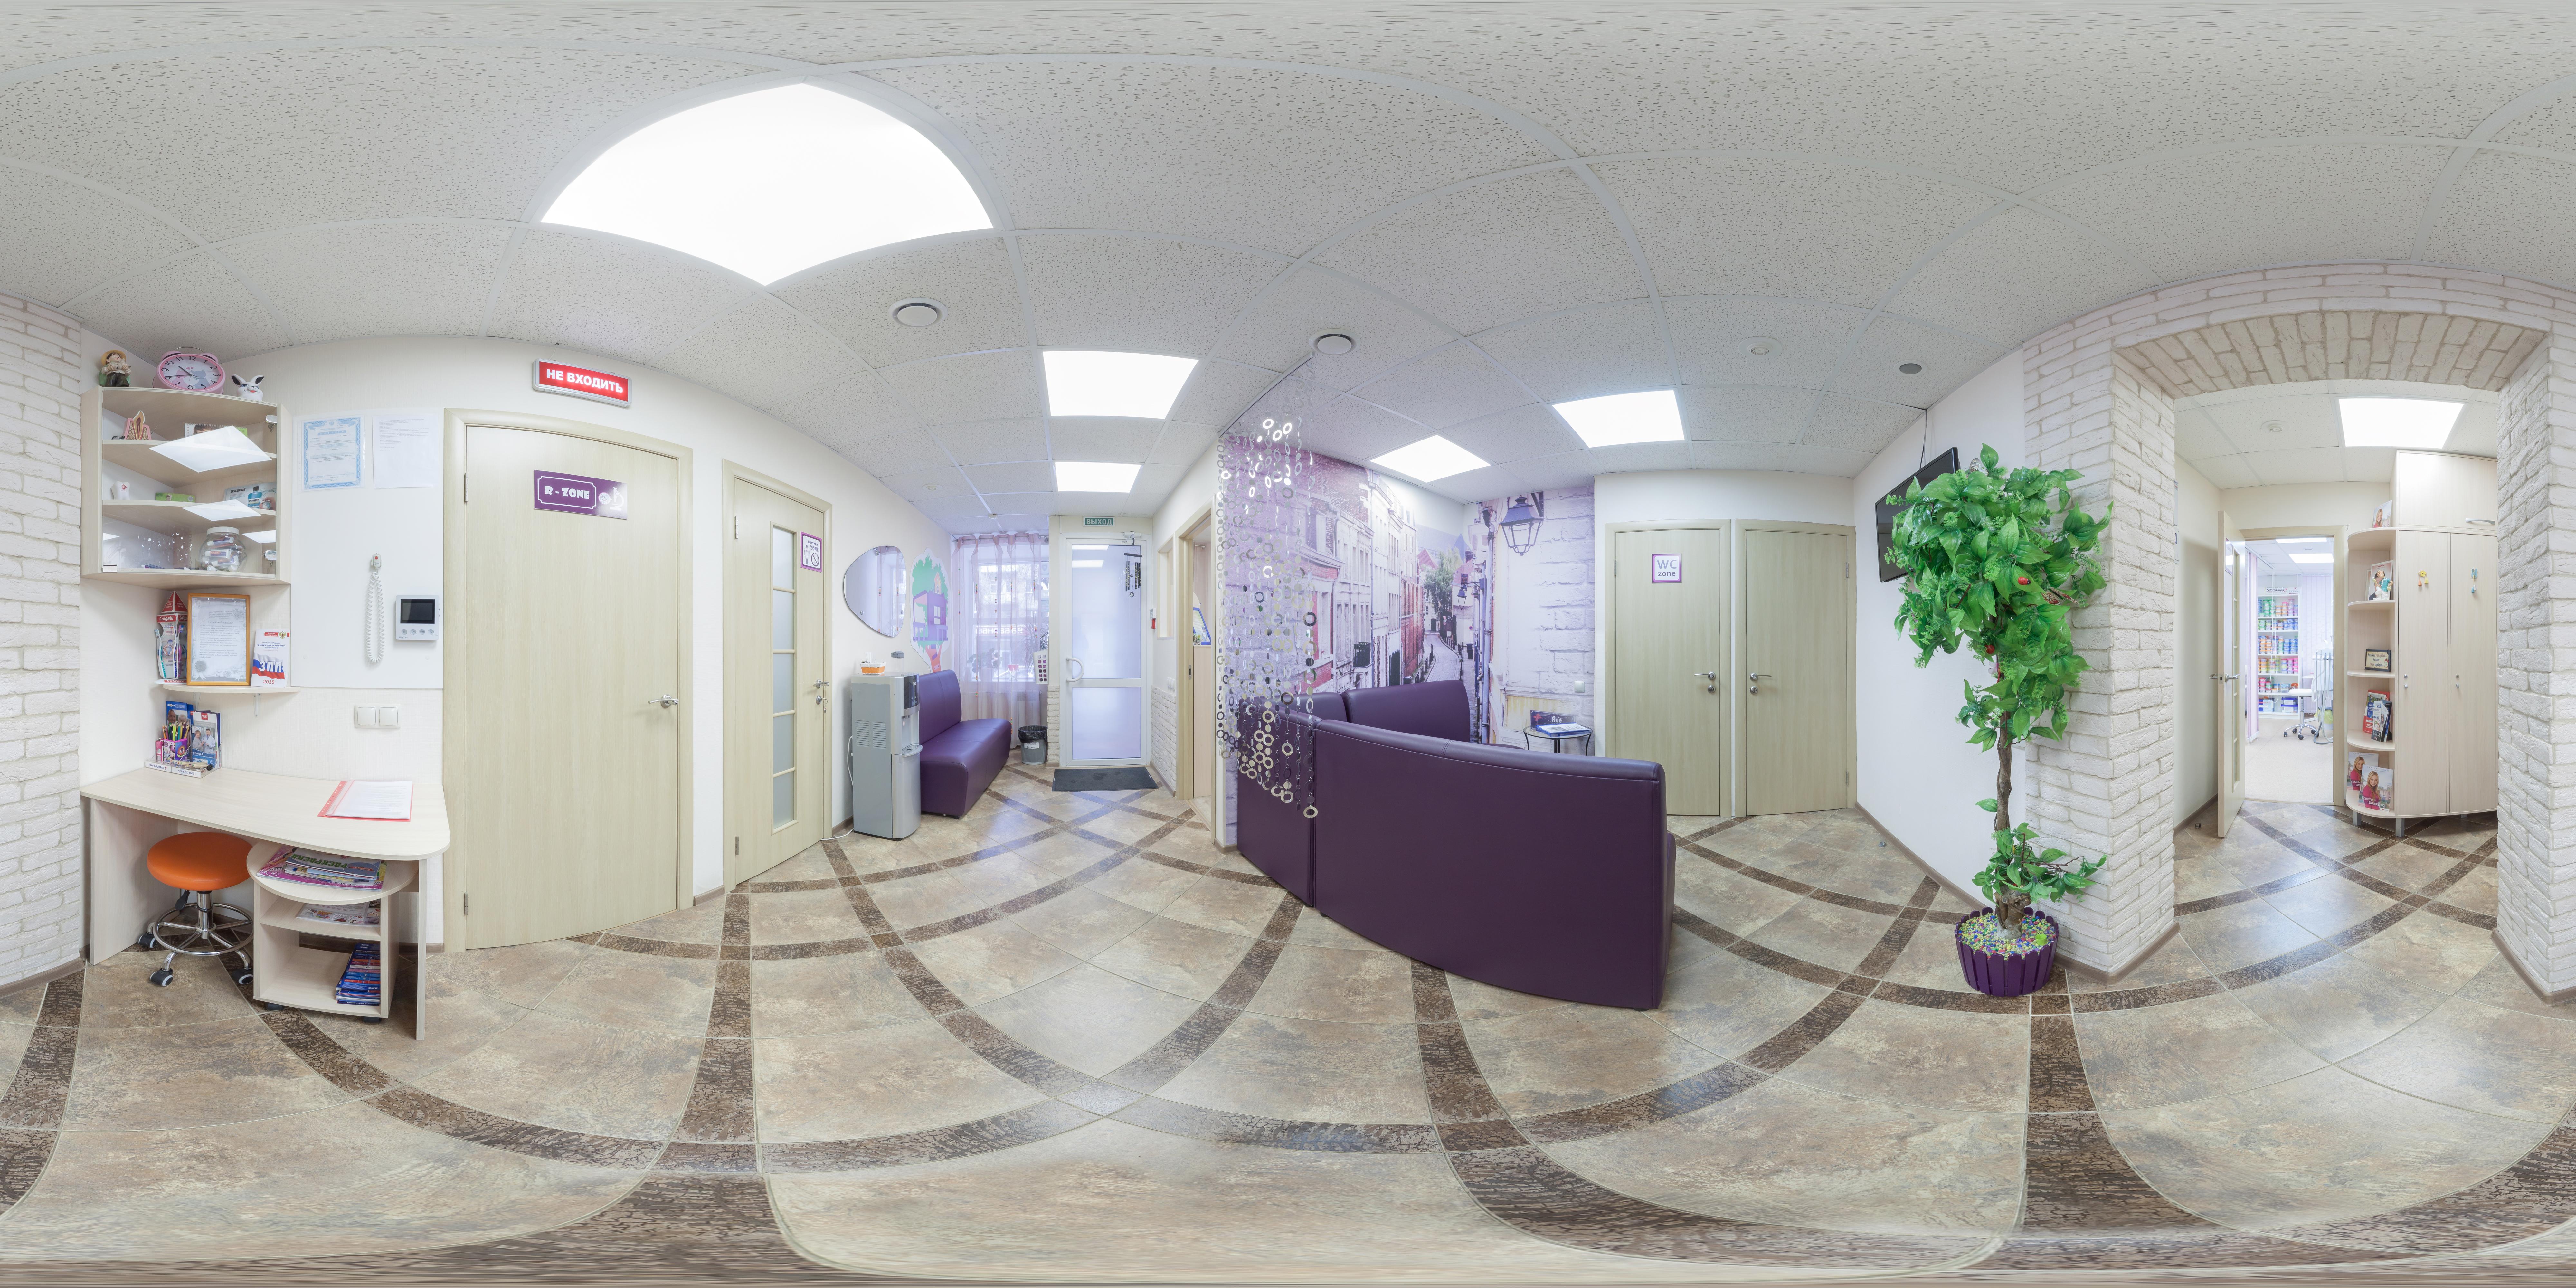 20151112-IMG_4415 Panorama_3_1